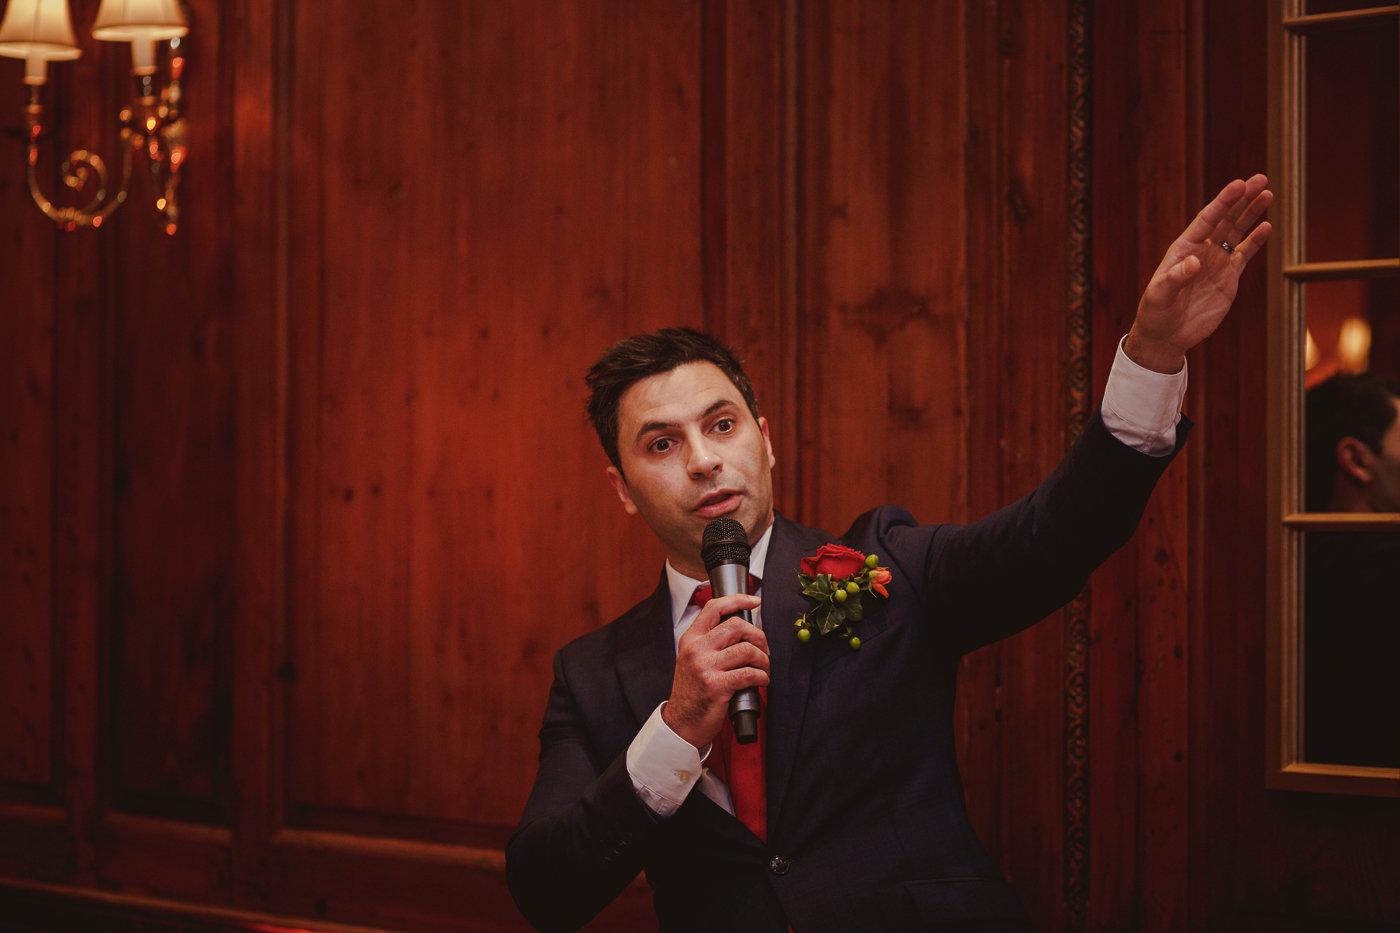 hedsor-house-wedding-photography-36.jpg